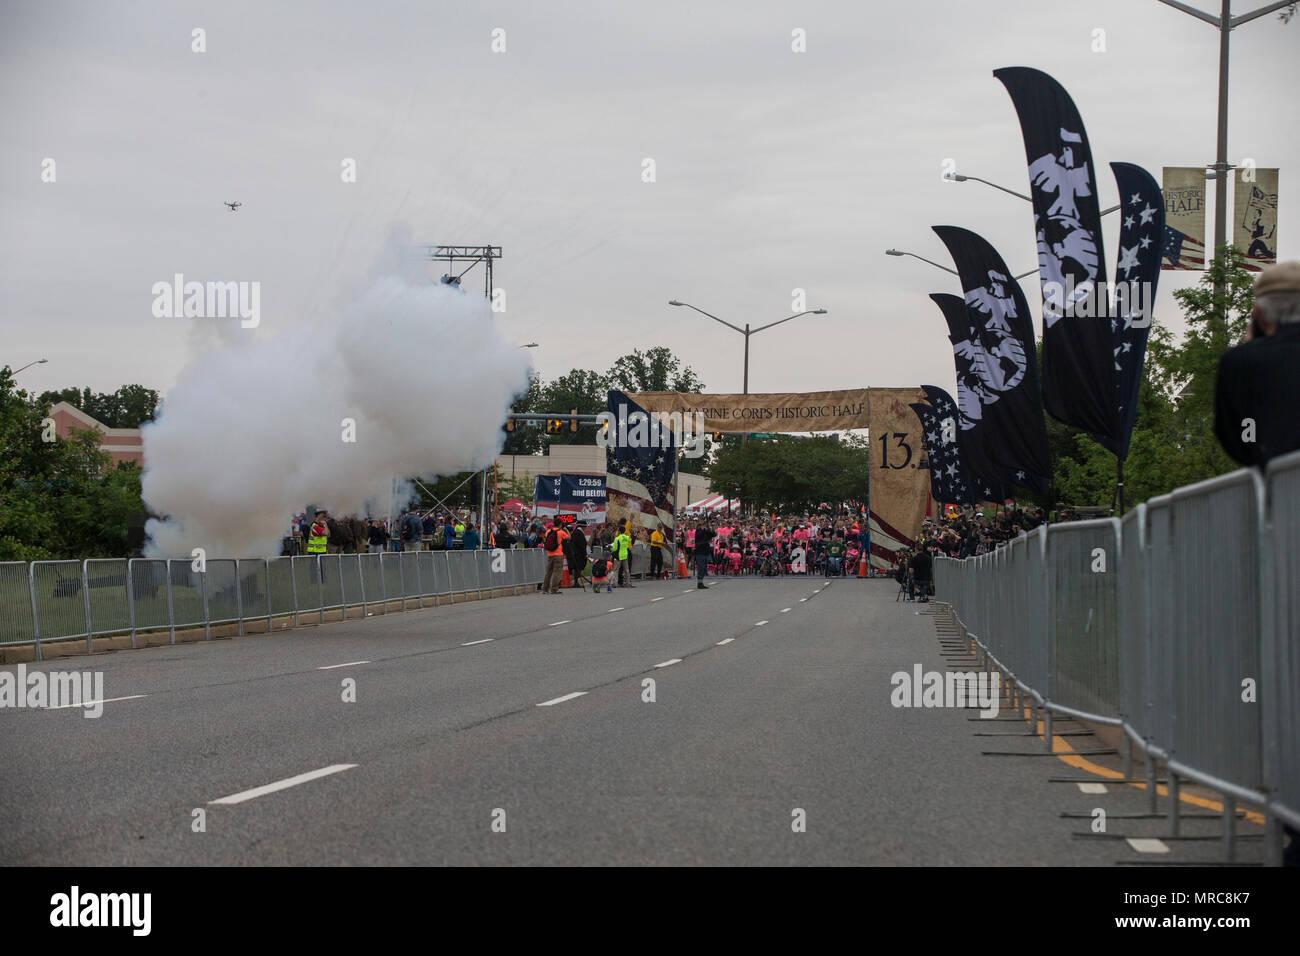 000 M Race At Stockfotos & 000 M Race At Bilder - Alamy